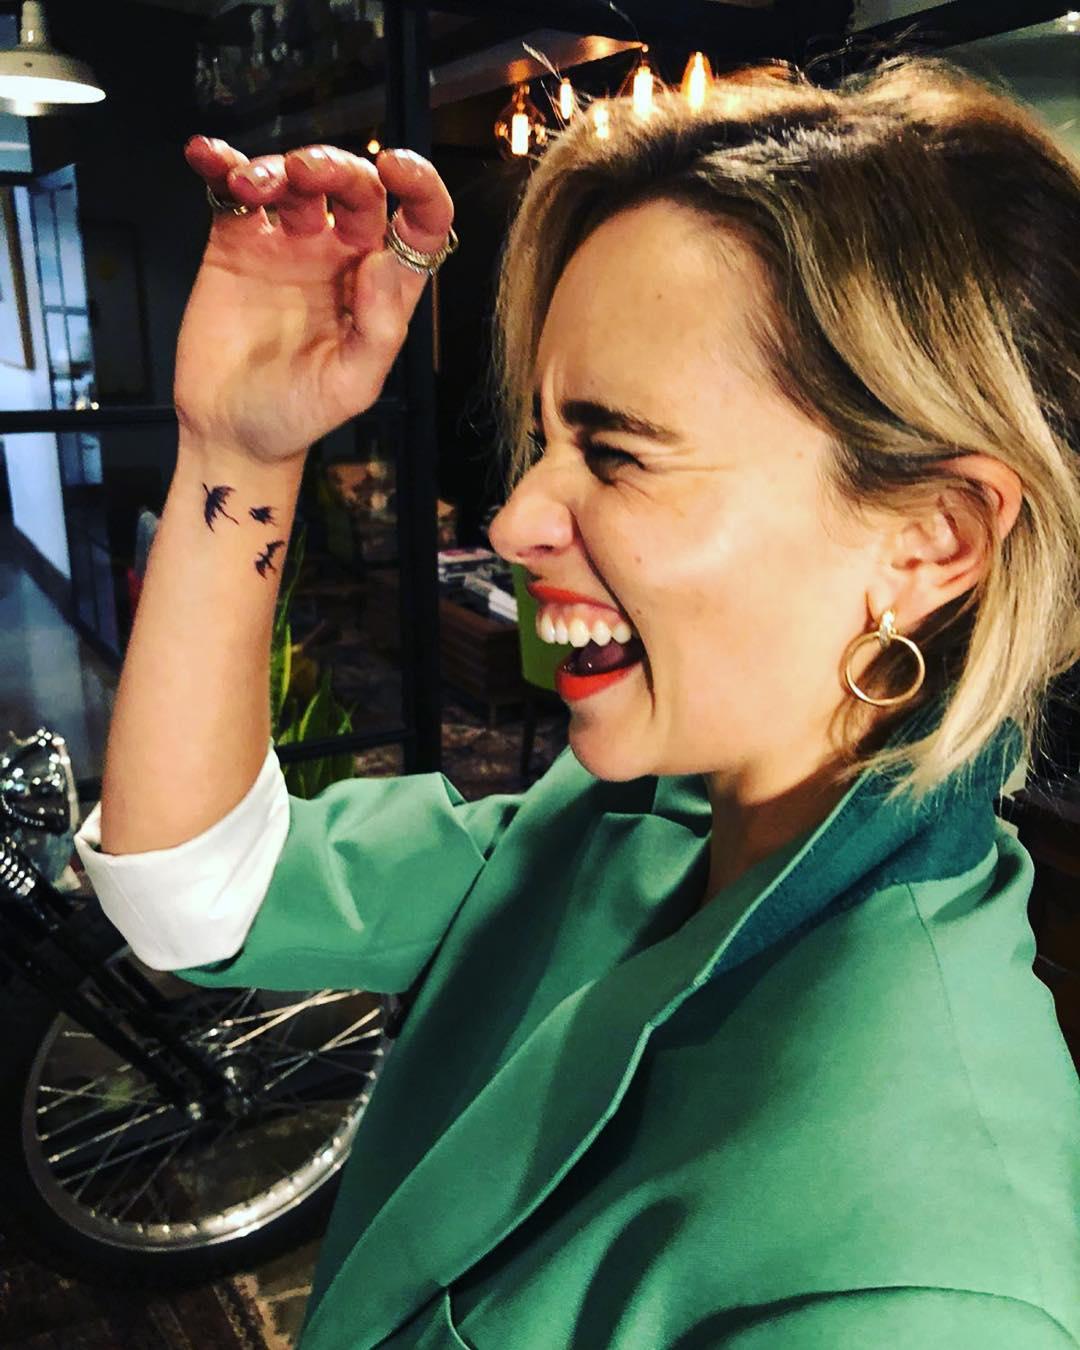 Dragons Tattoo On Emilia Clarke 2019